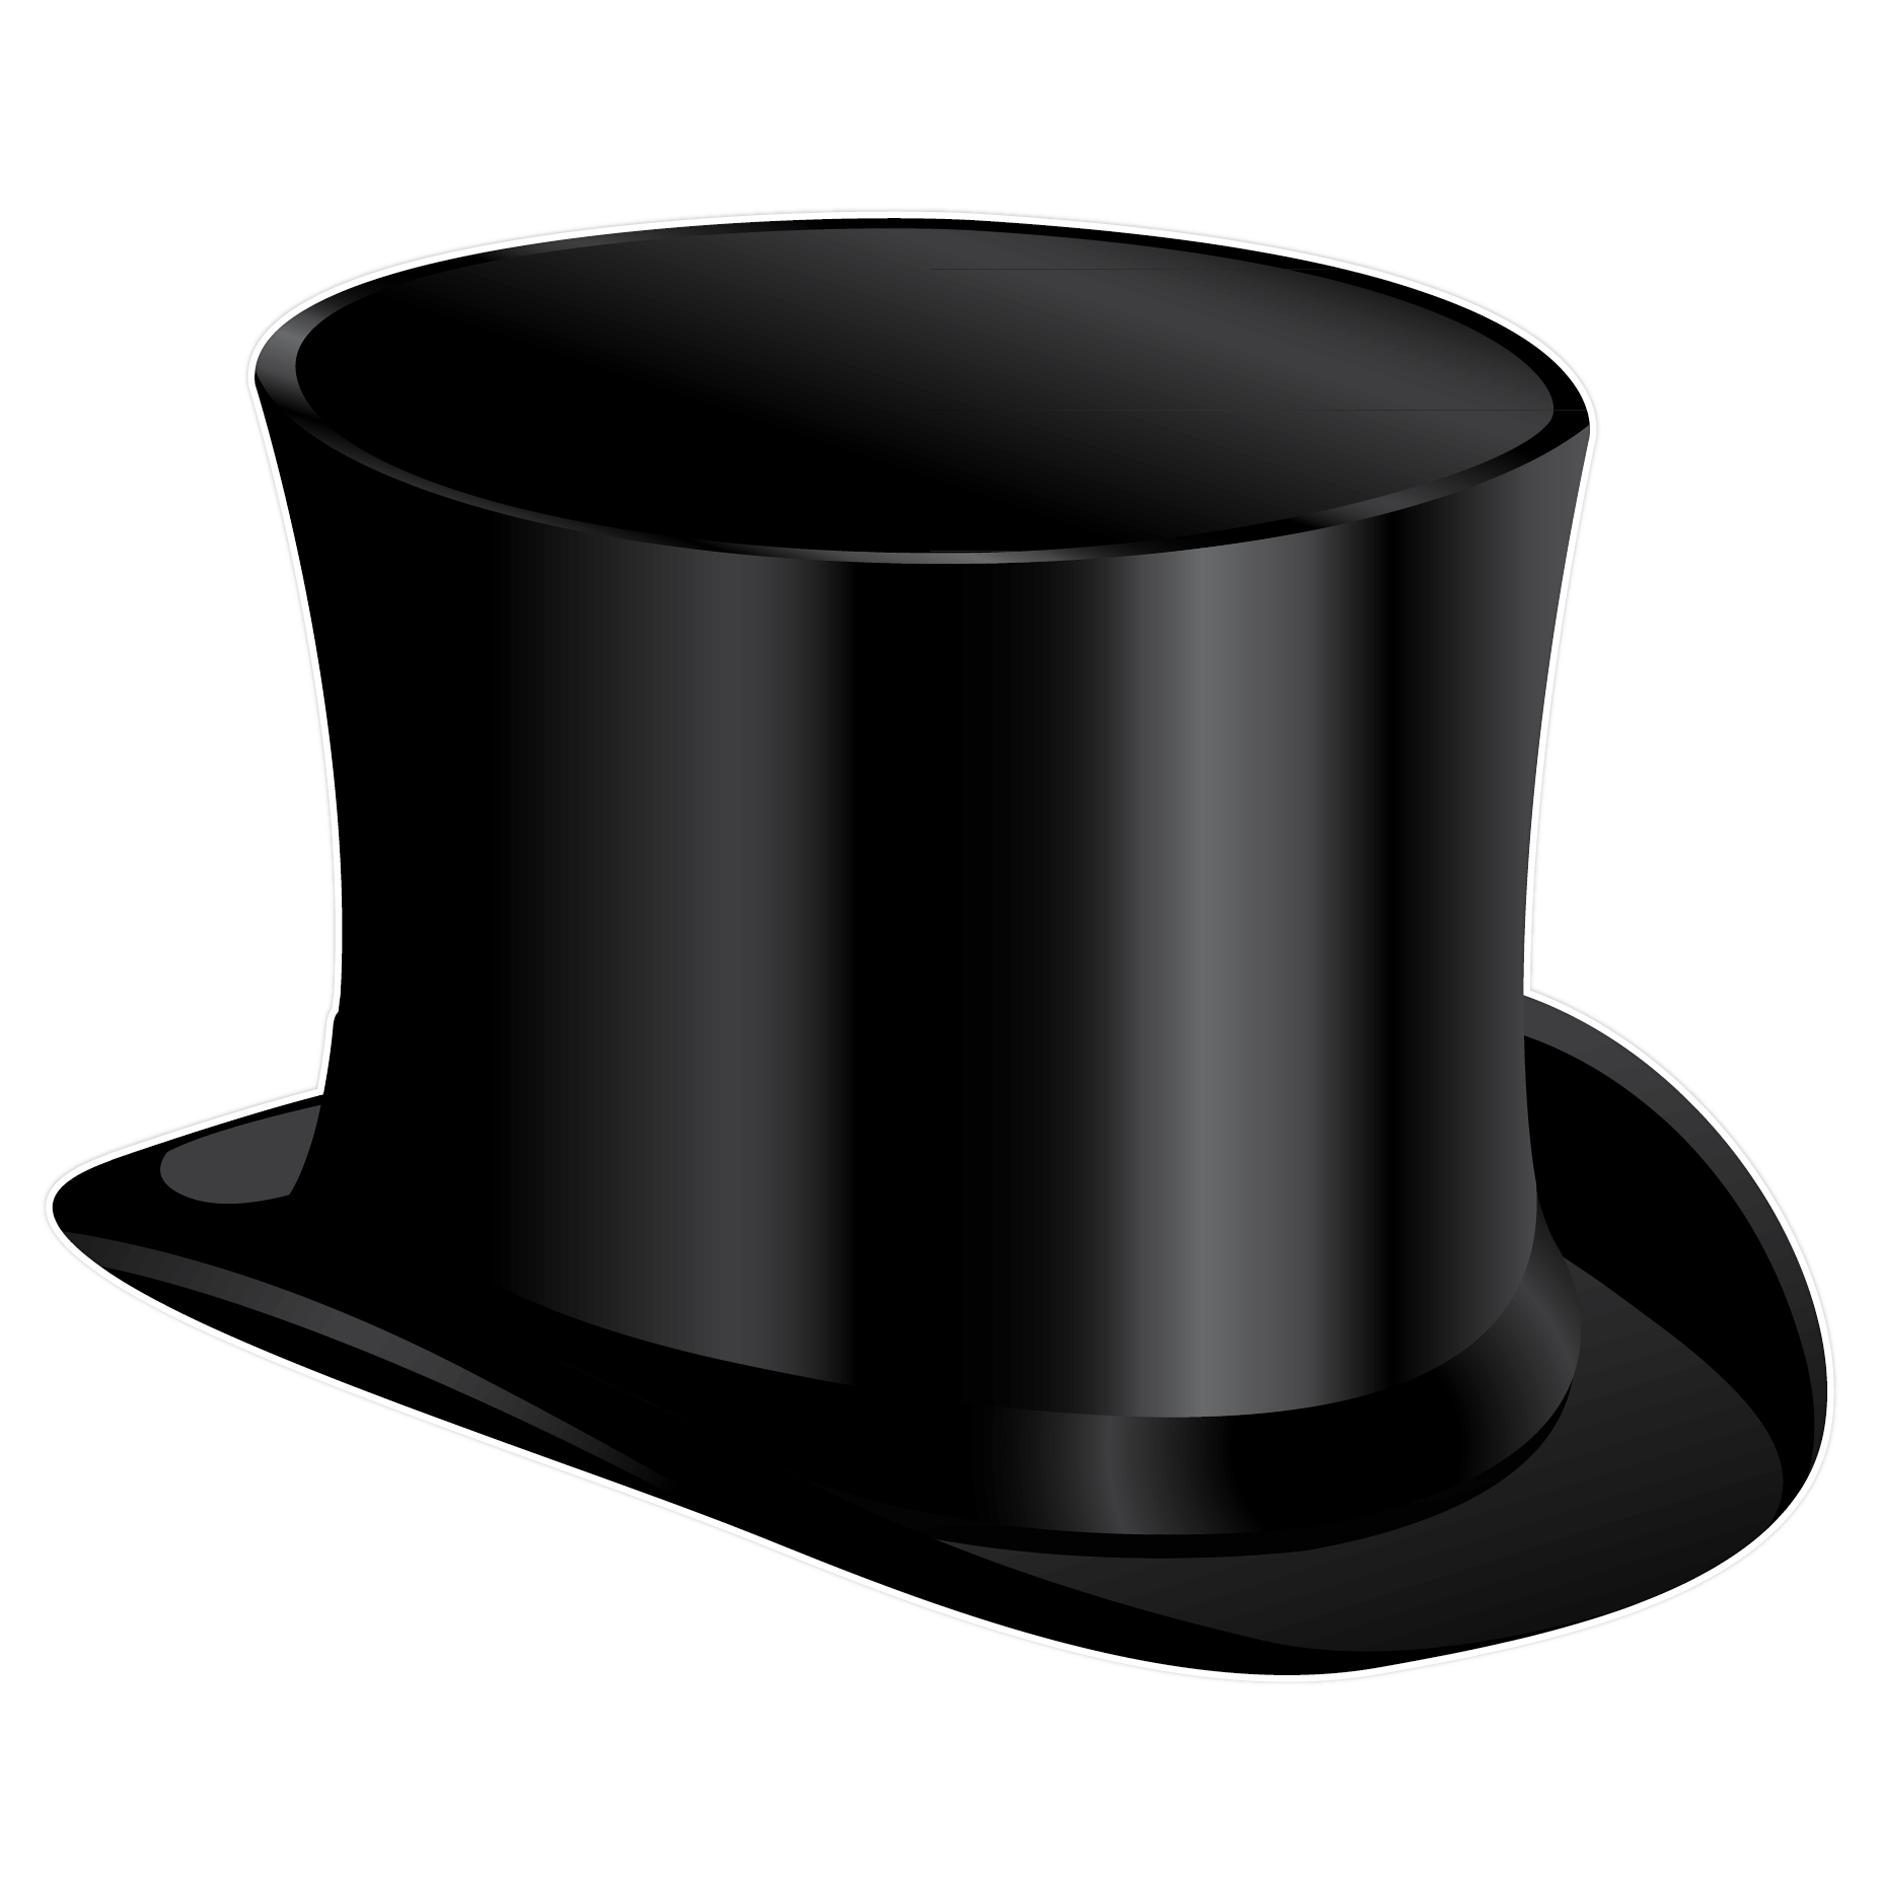 Free Top Hat Cliparts, Download Free Clip Art, Free Clip Art.